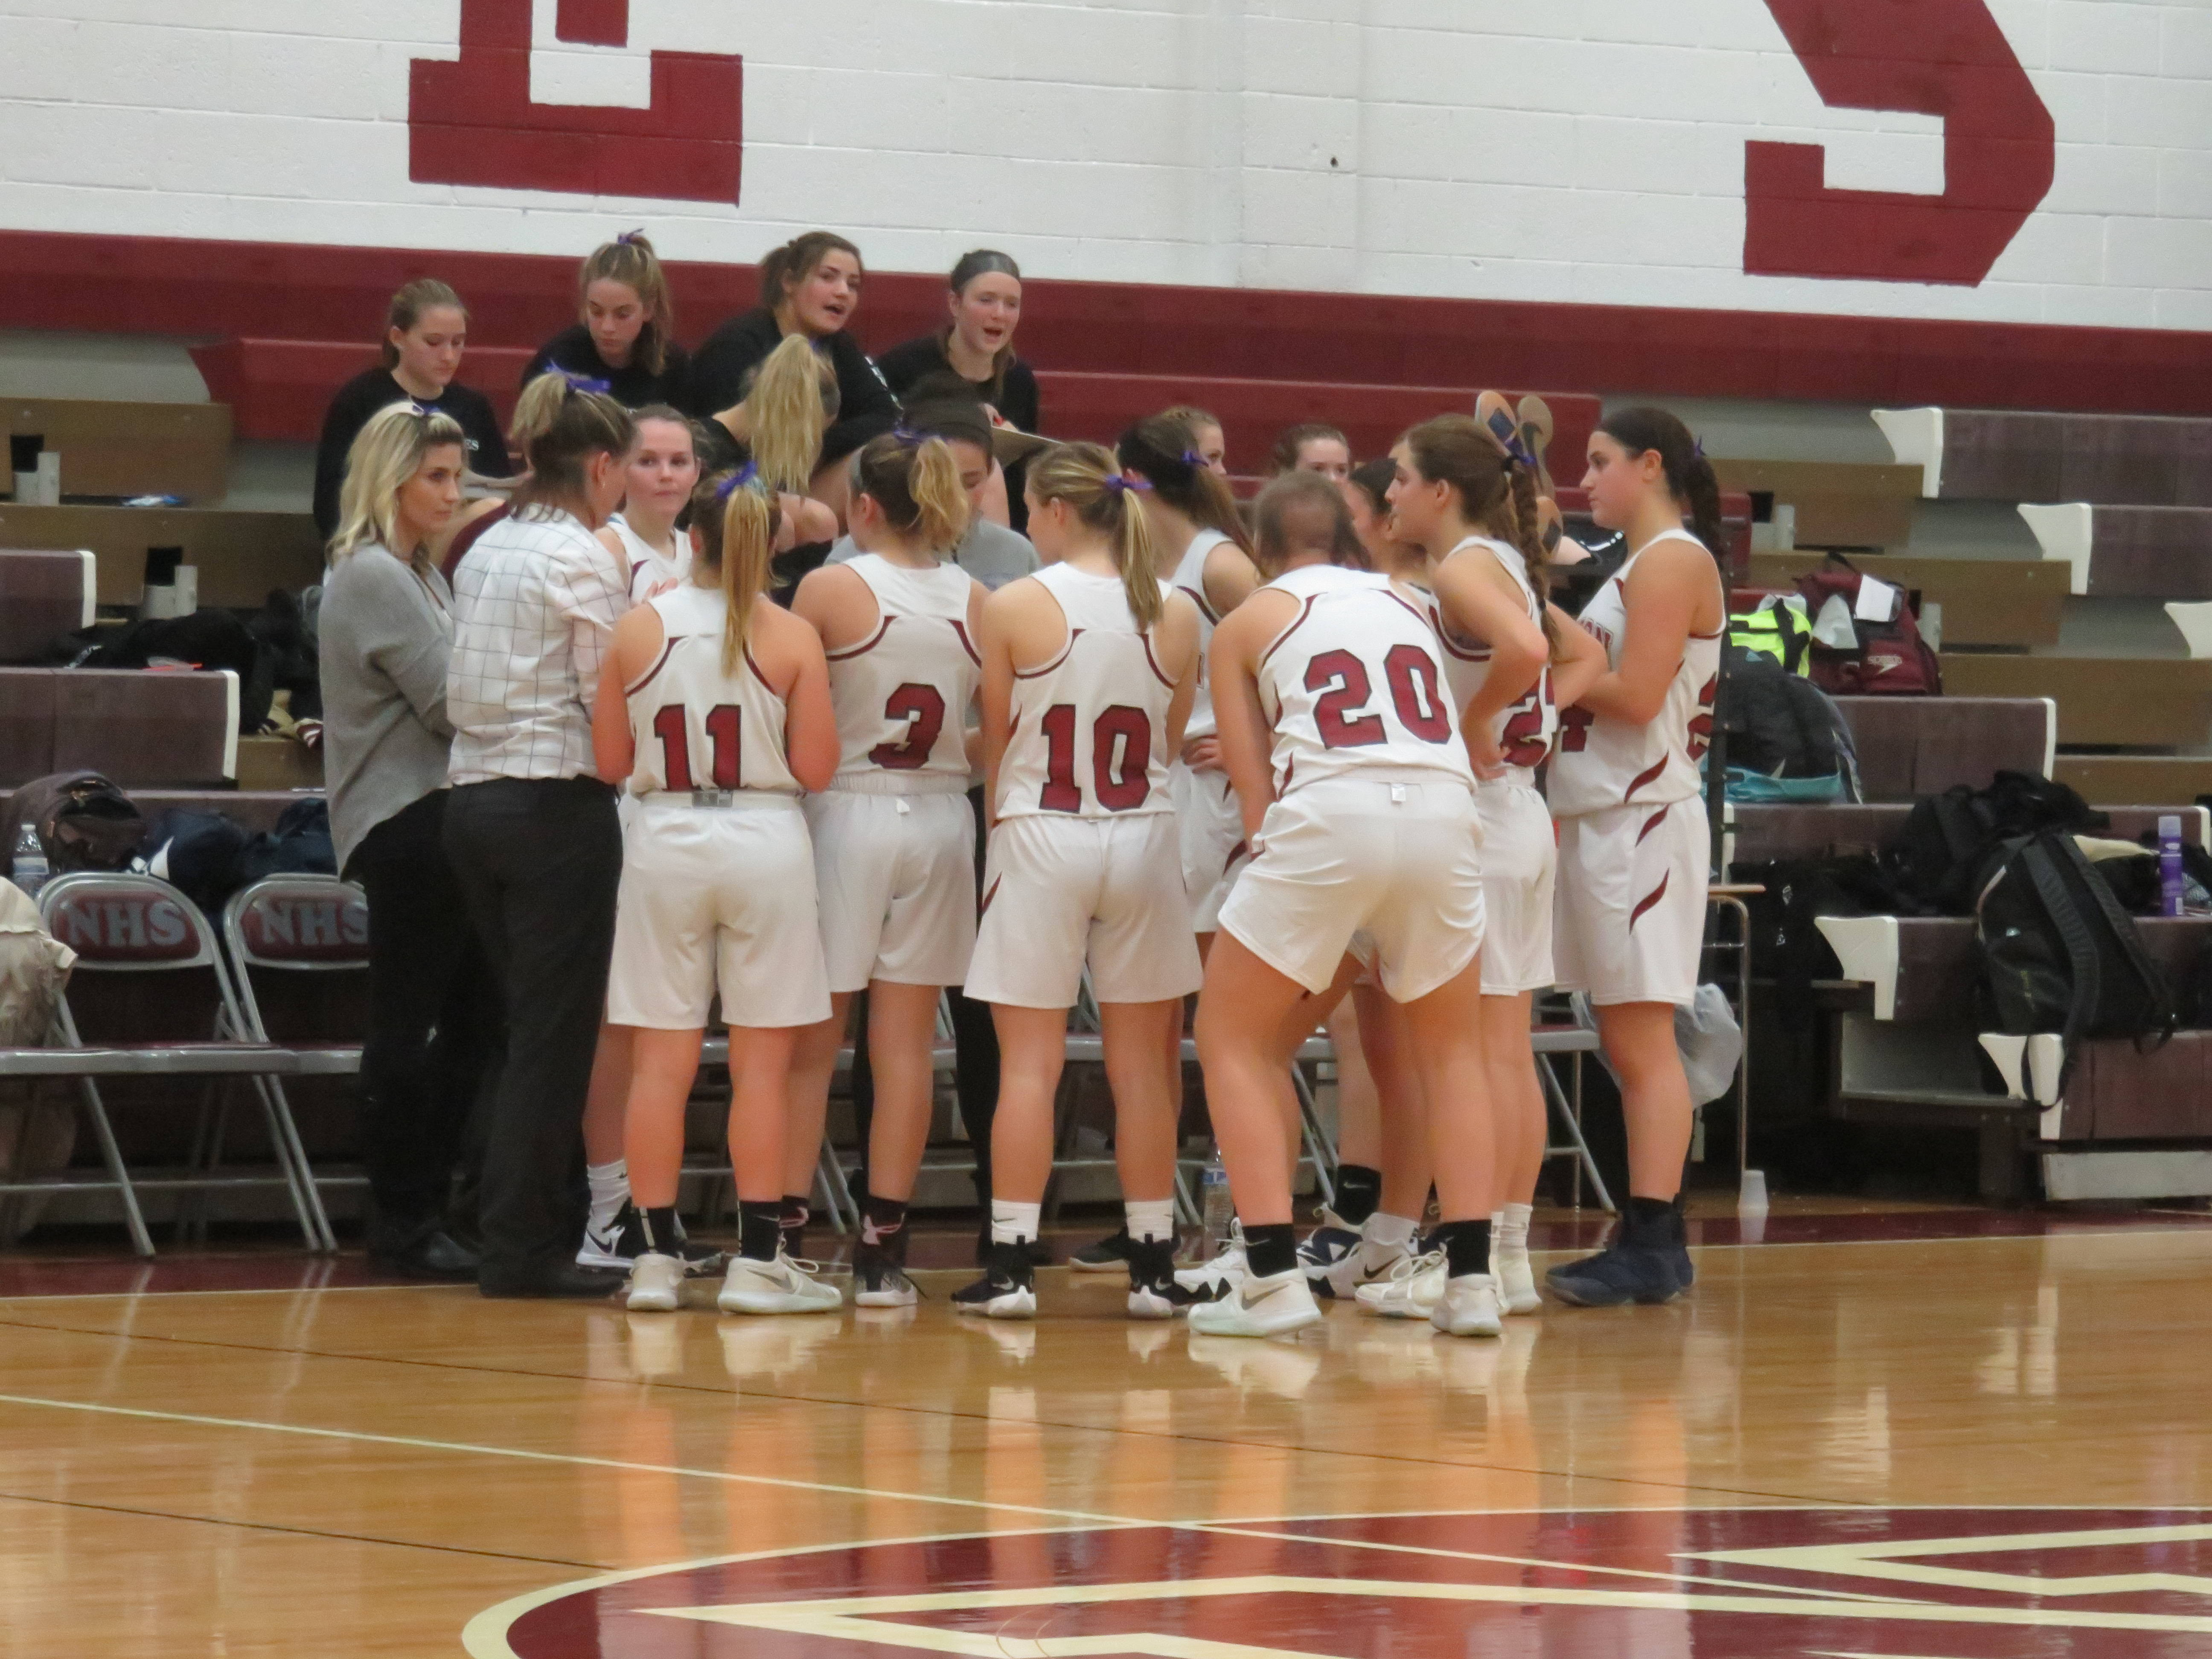 Newton Girls Basketball Team Takes First Loss of the Season